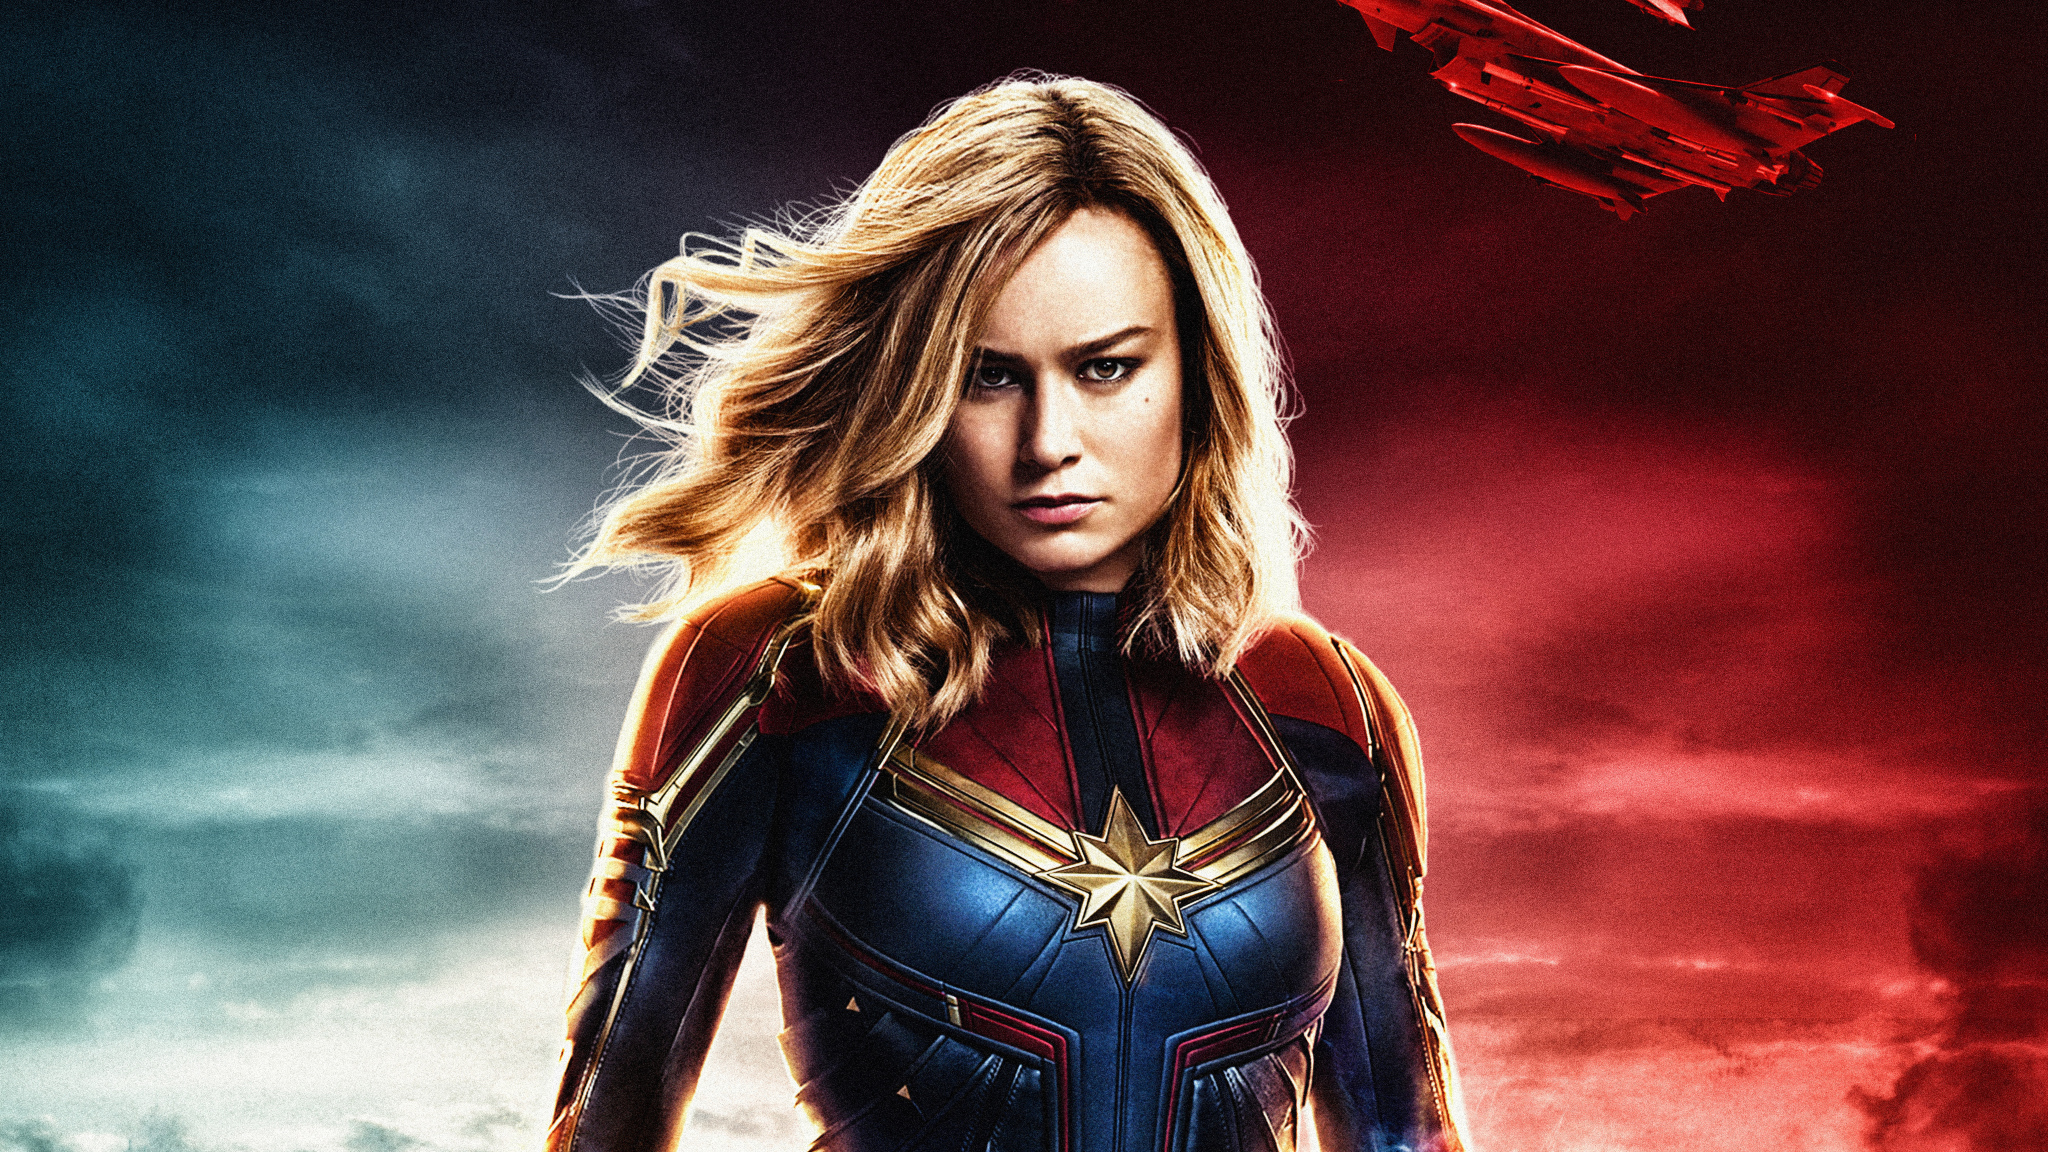 2048x1152 2019 Captain Marvel Movie 2048x1152 Resolution